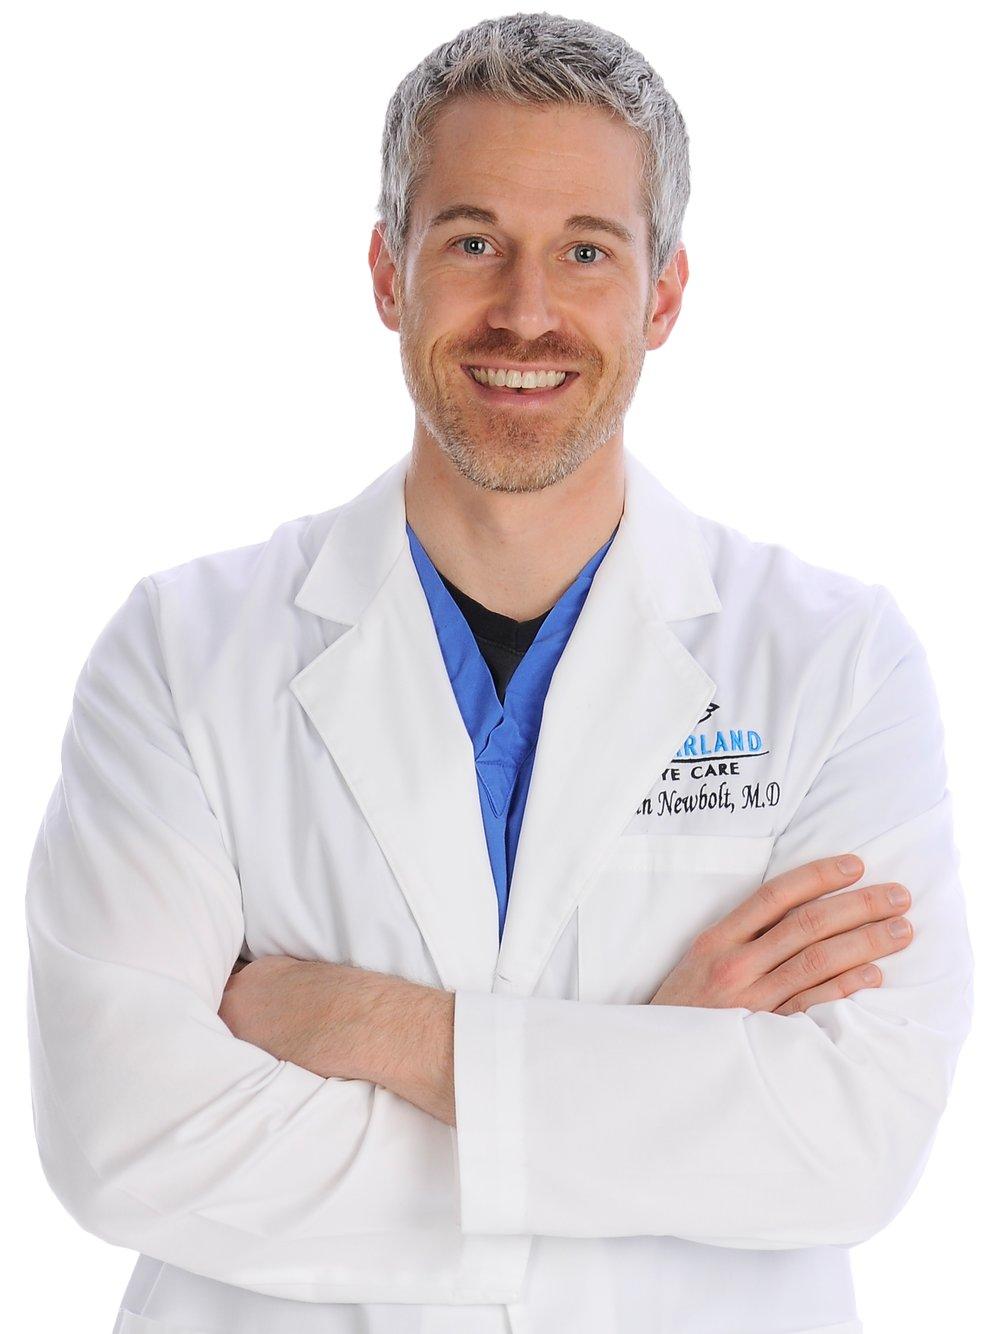 Dr. Evan Newbolt - McFarland Eye Care